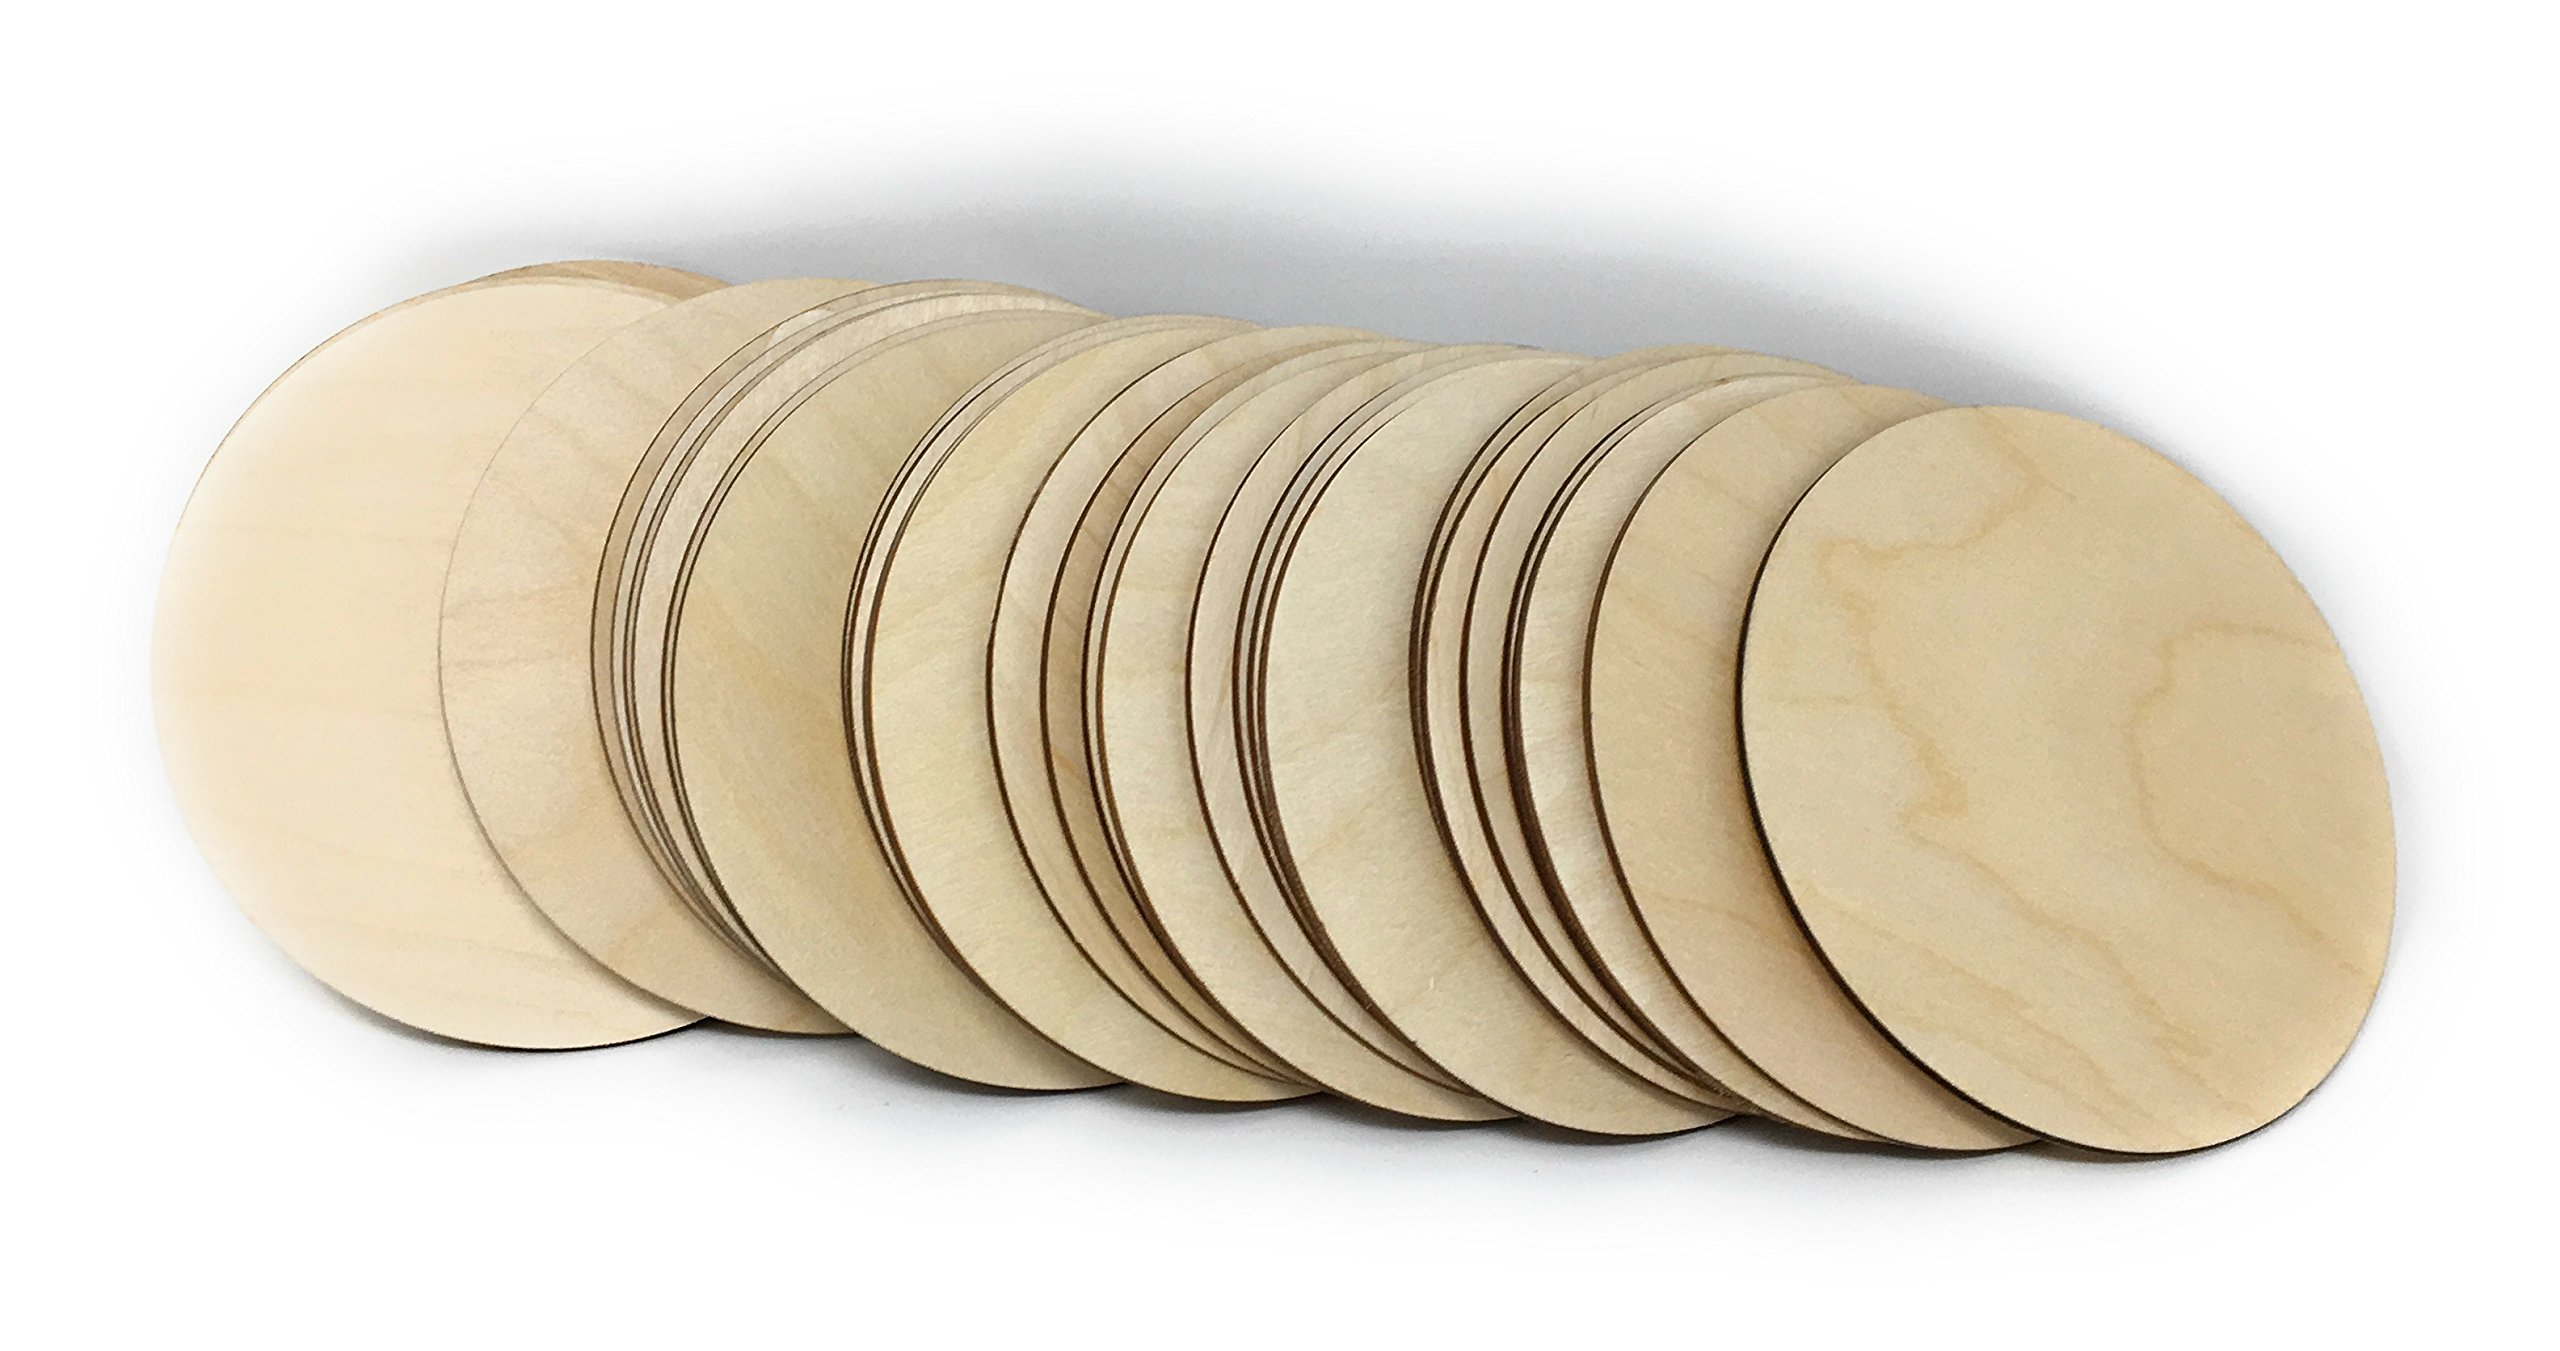 "Gocutouts 10"" Wooden Circles Cutouts Package of 10 Circles Baltic Birch (10"" x10)"